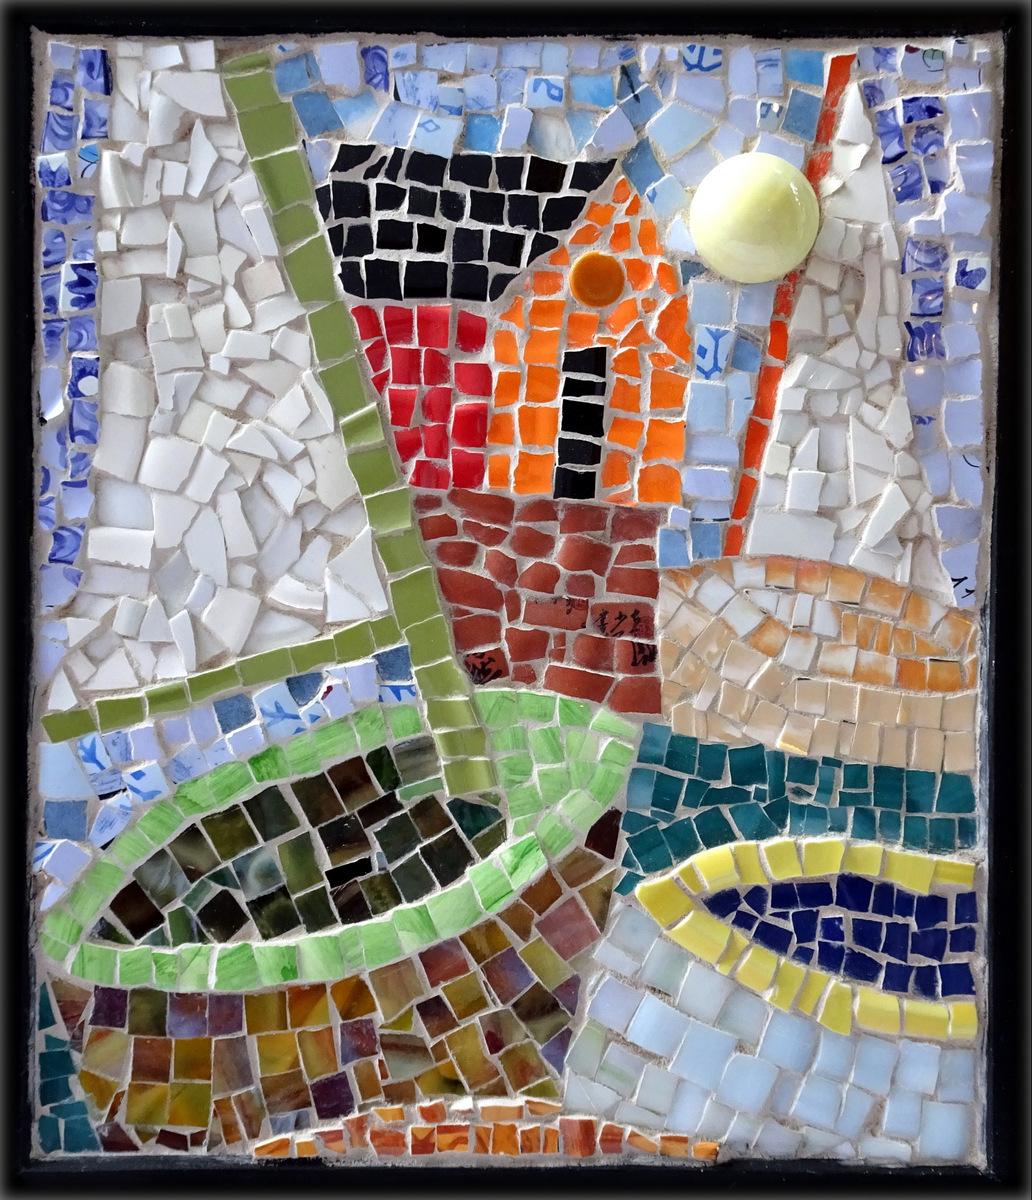 Pat Austin, Mosaic Wall Pieces, SVFAL-001.JPG